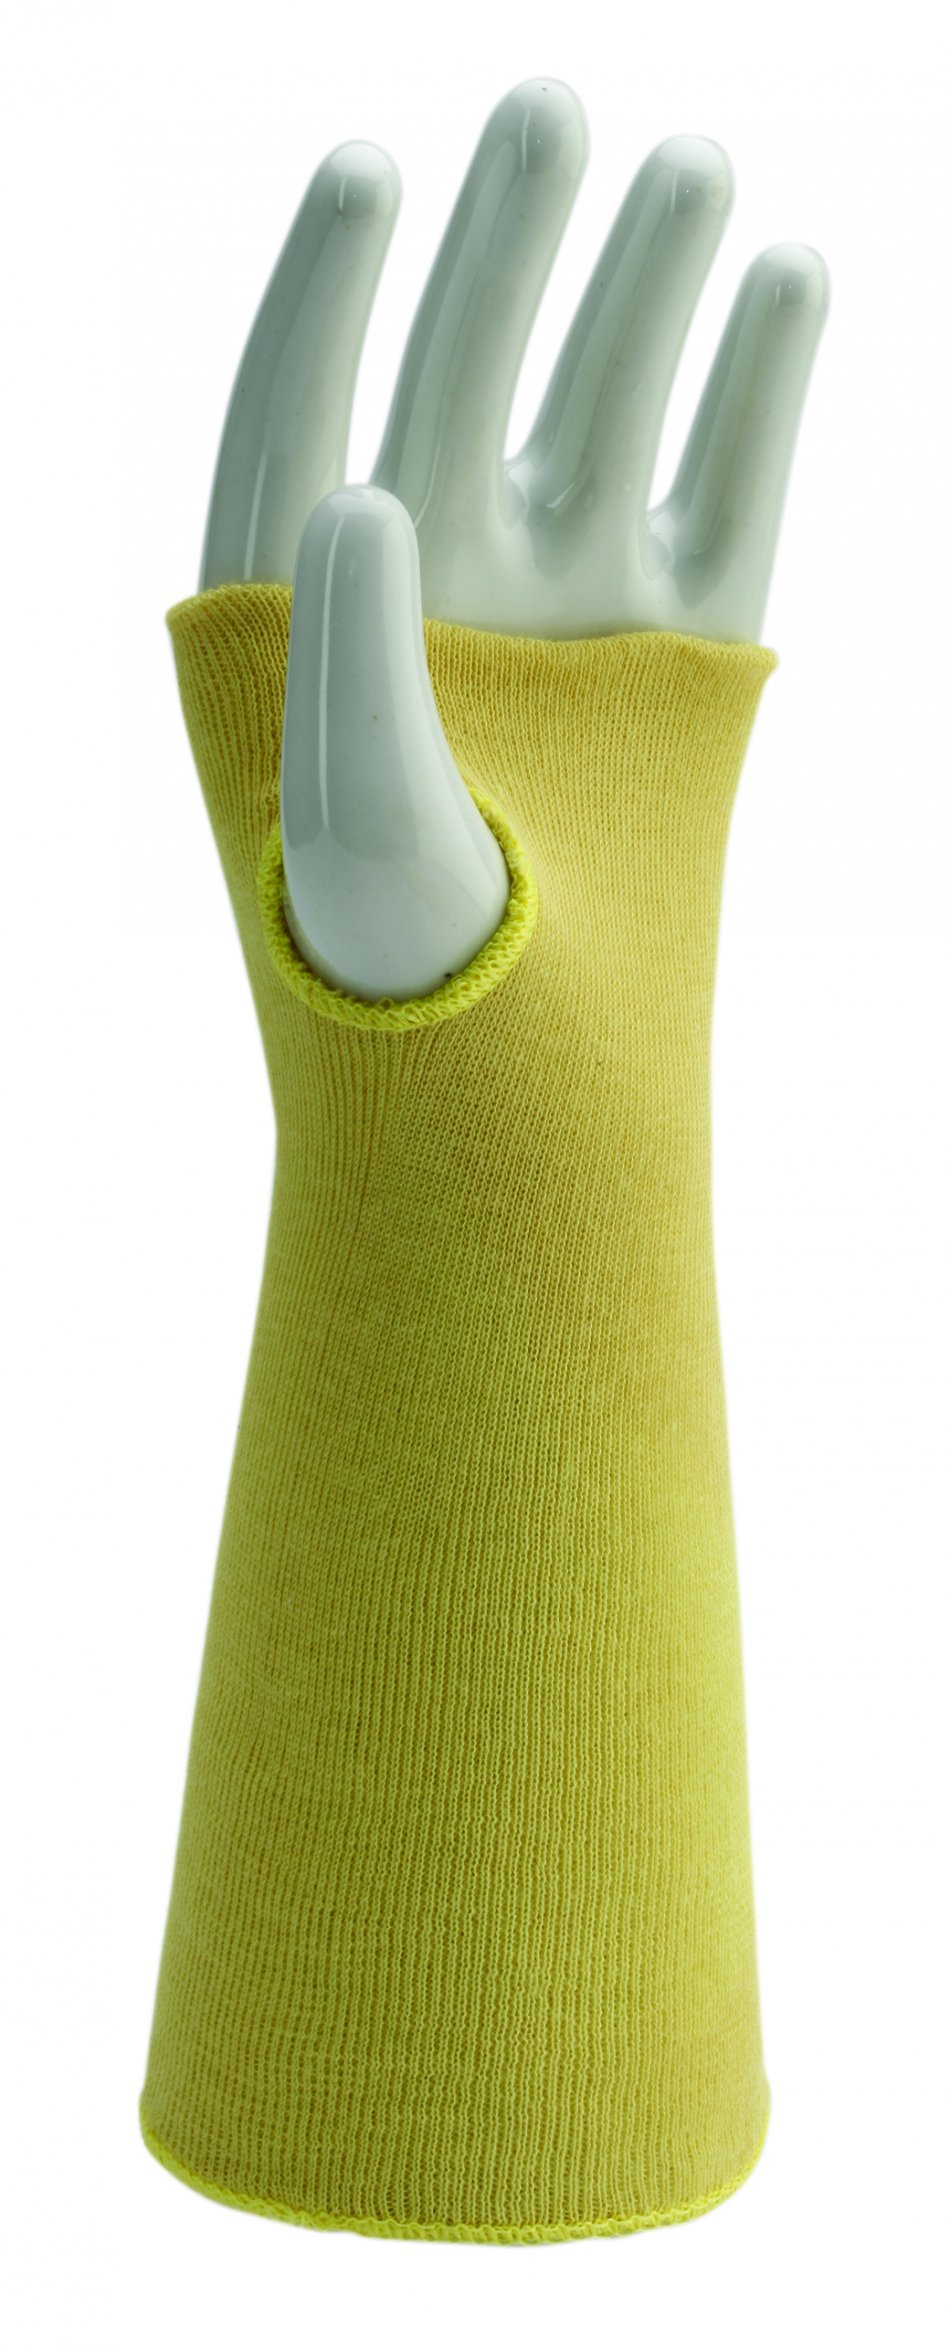 Protector kevlar pentru antebraţ,55 cm